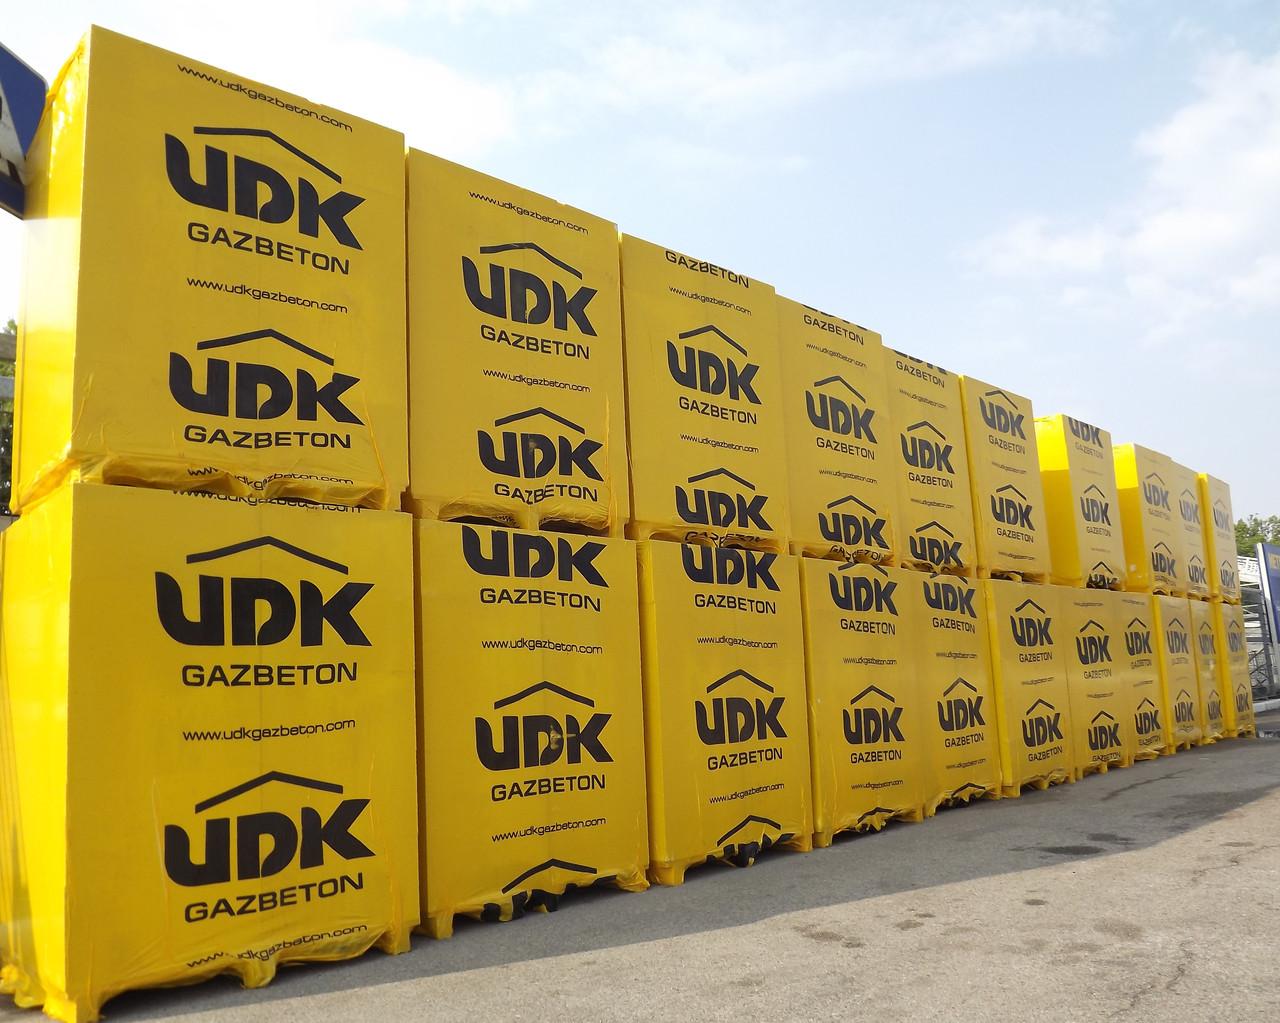 Блок газобетоный UDK 600Х200Х100 газоблок стіновий